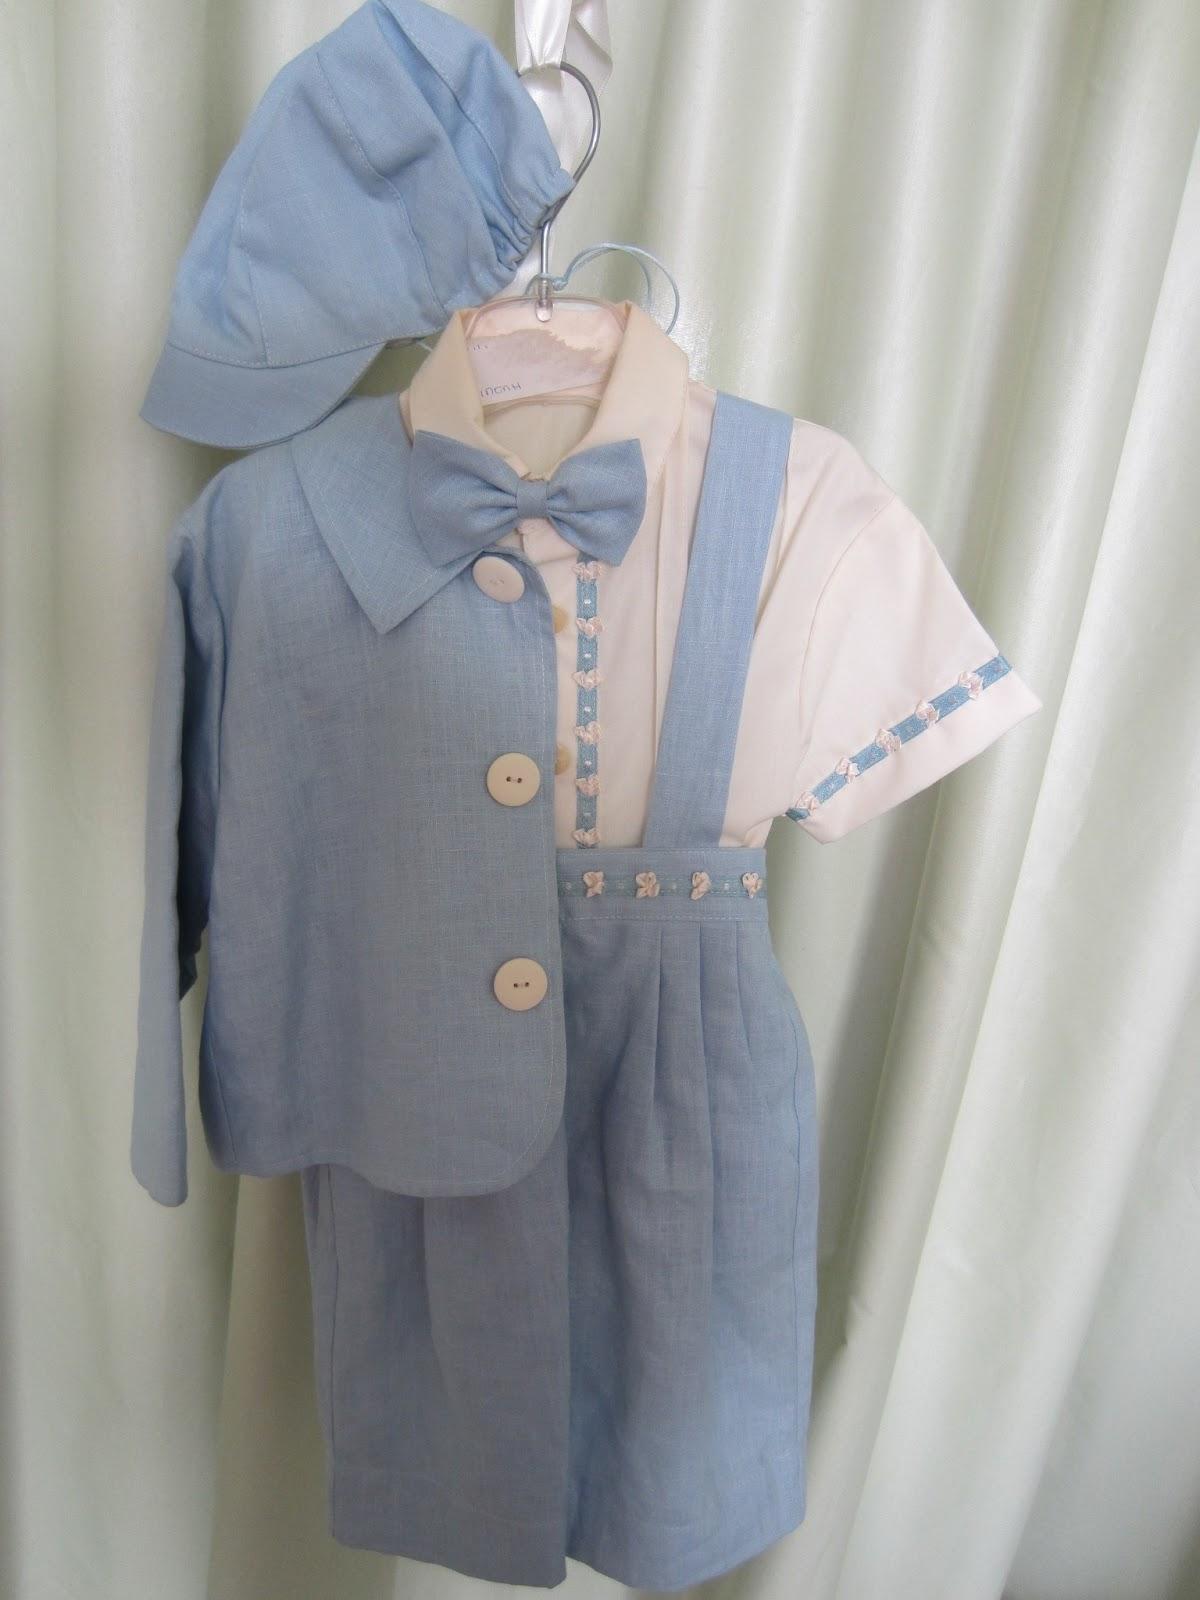 d68b816a0e6 Παντελόνι, πουκάμισο, παπιόν, σακάκι και καπέλο. Νο 1. Τιμή: 60 ευρώ.